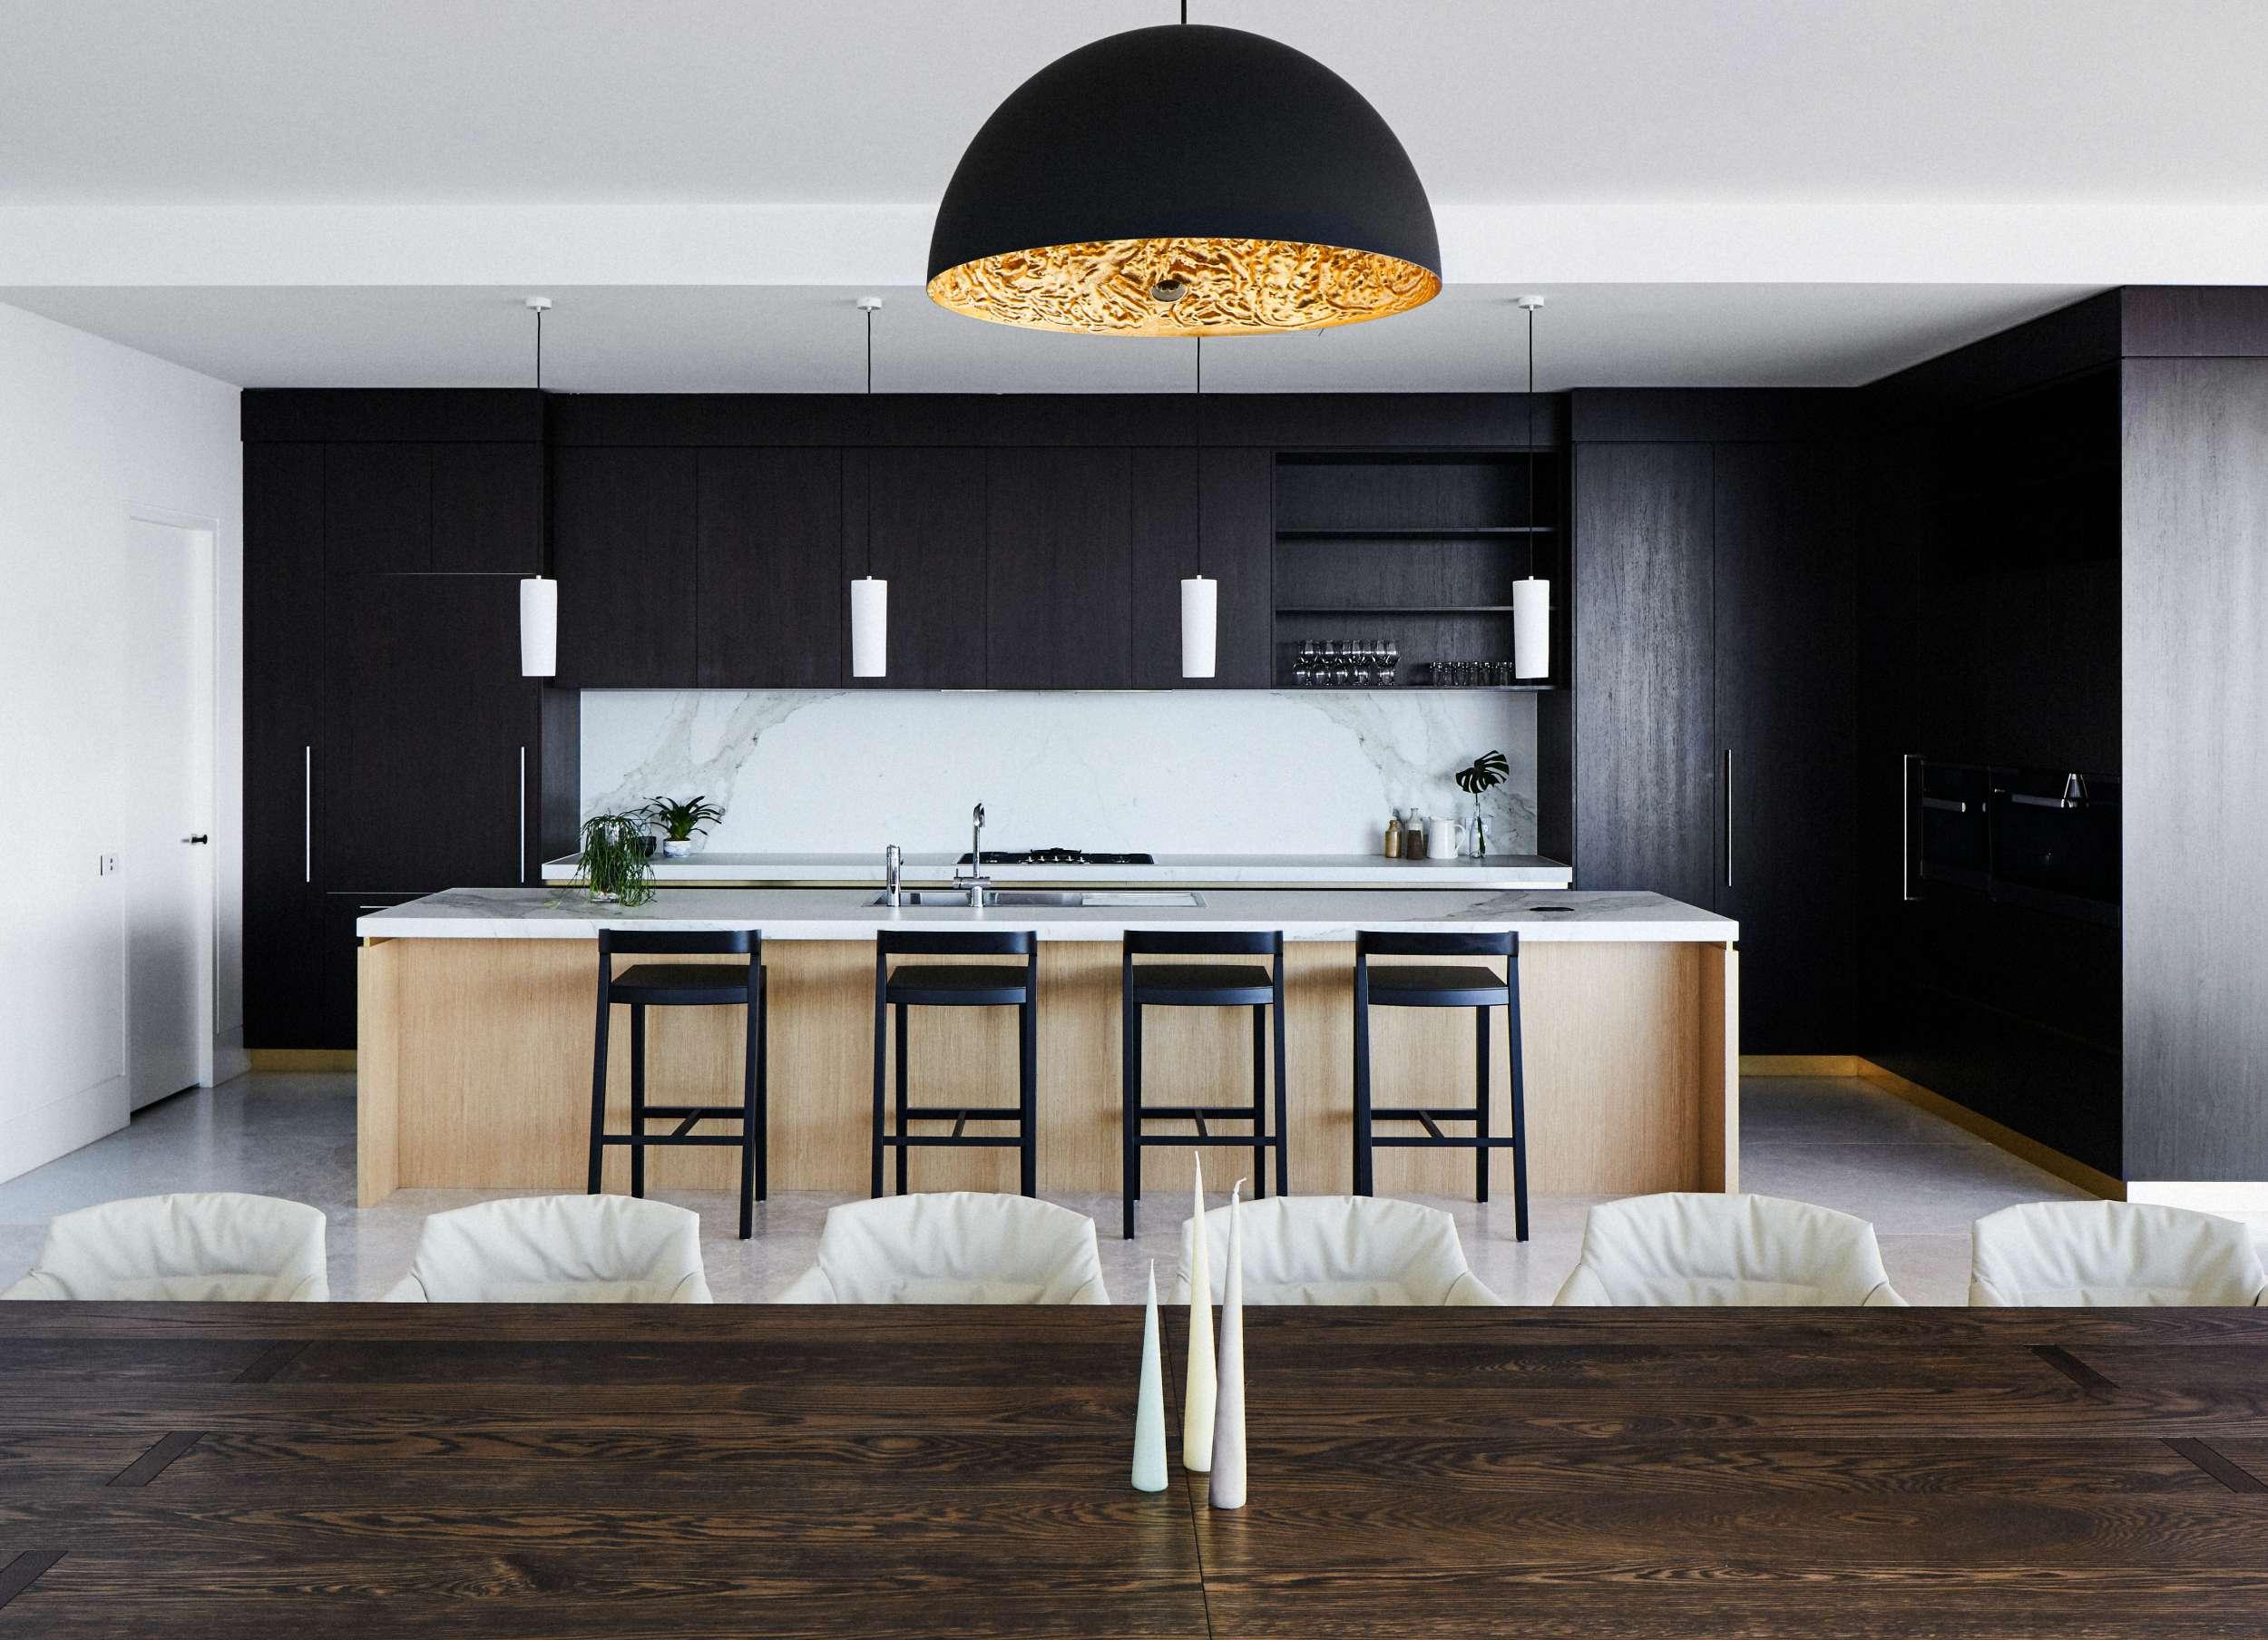 Southbank apartment design, Melbourne, interior decoration kitchen.jpg